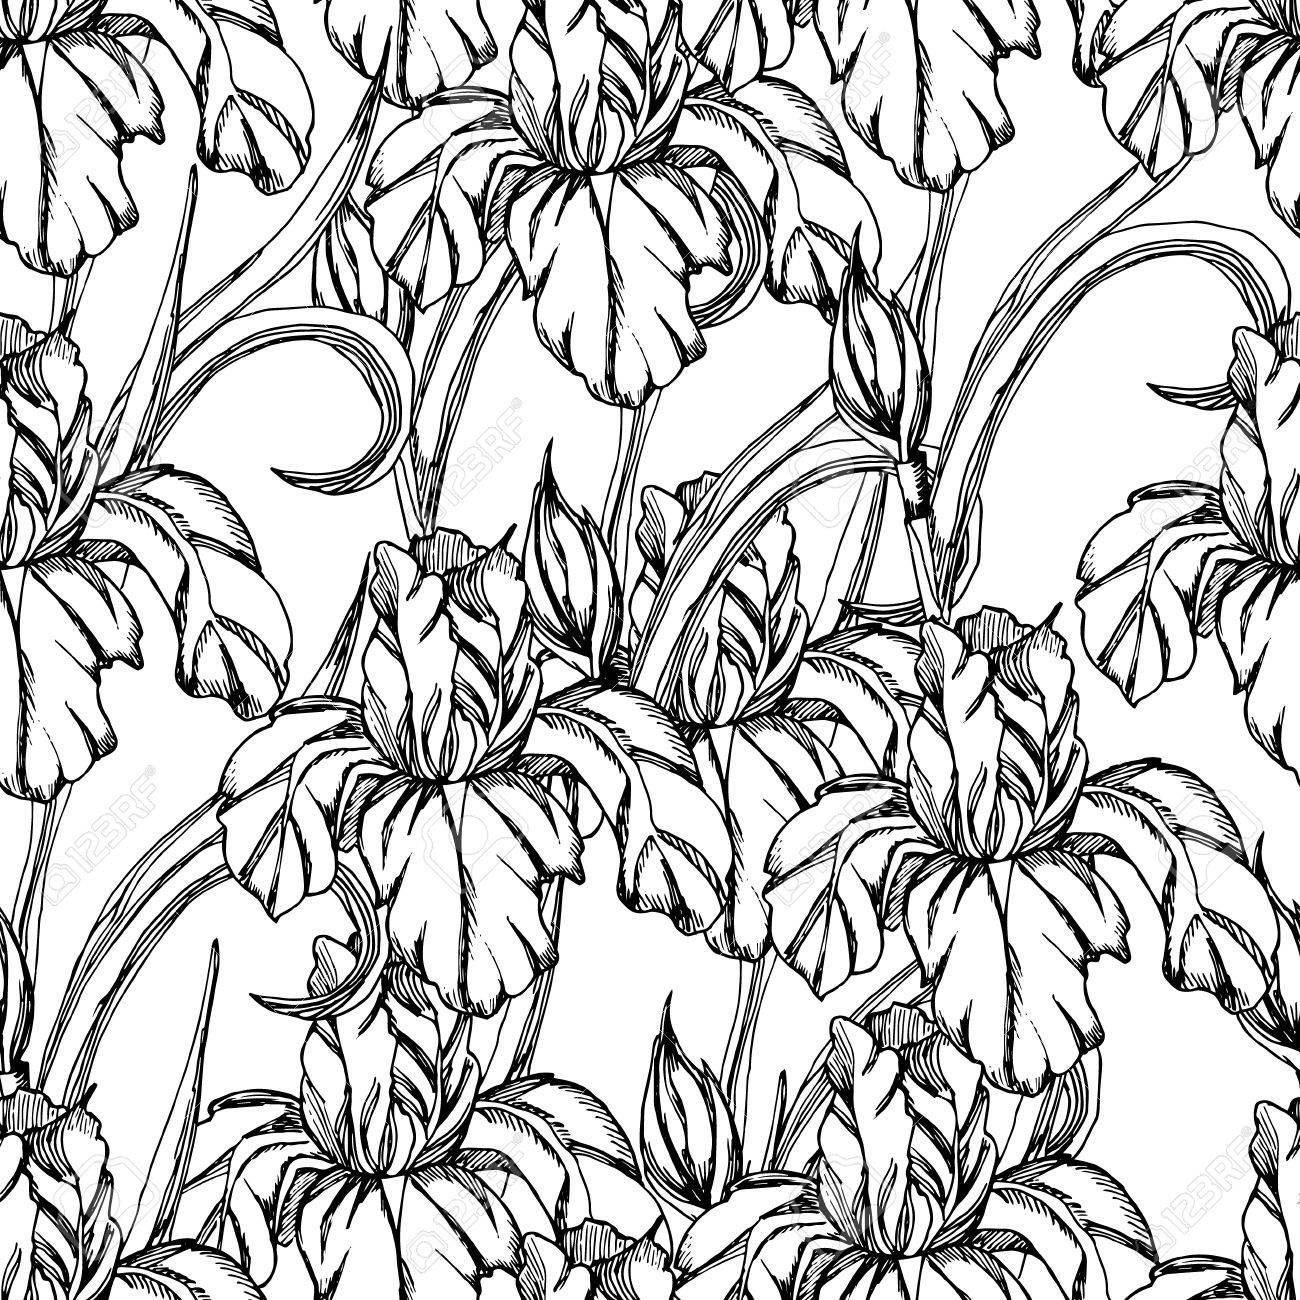 Seamless Patternetch Flowerctor Decorative Trace Of Iris